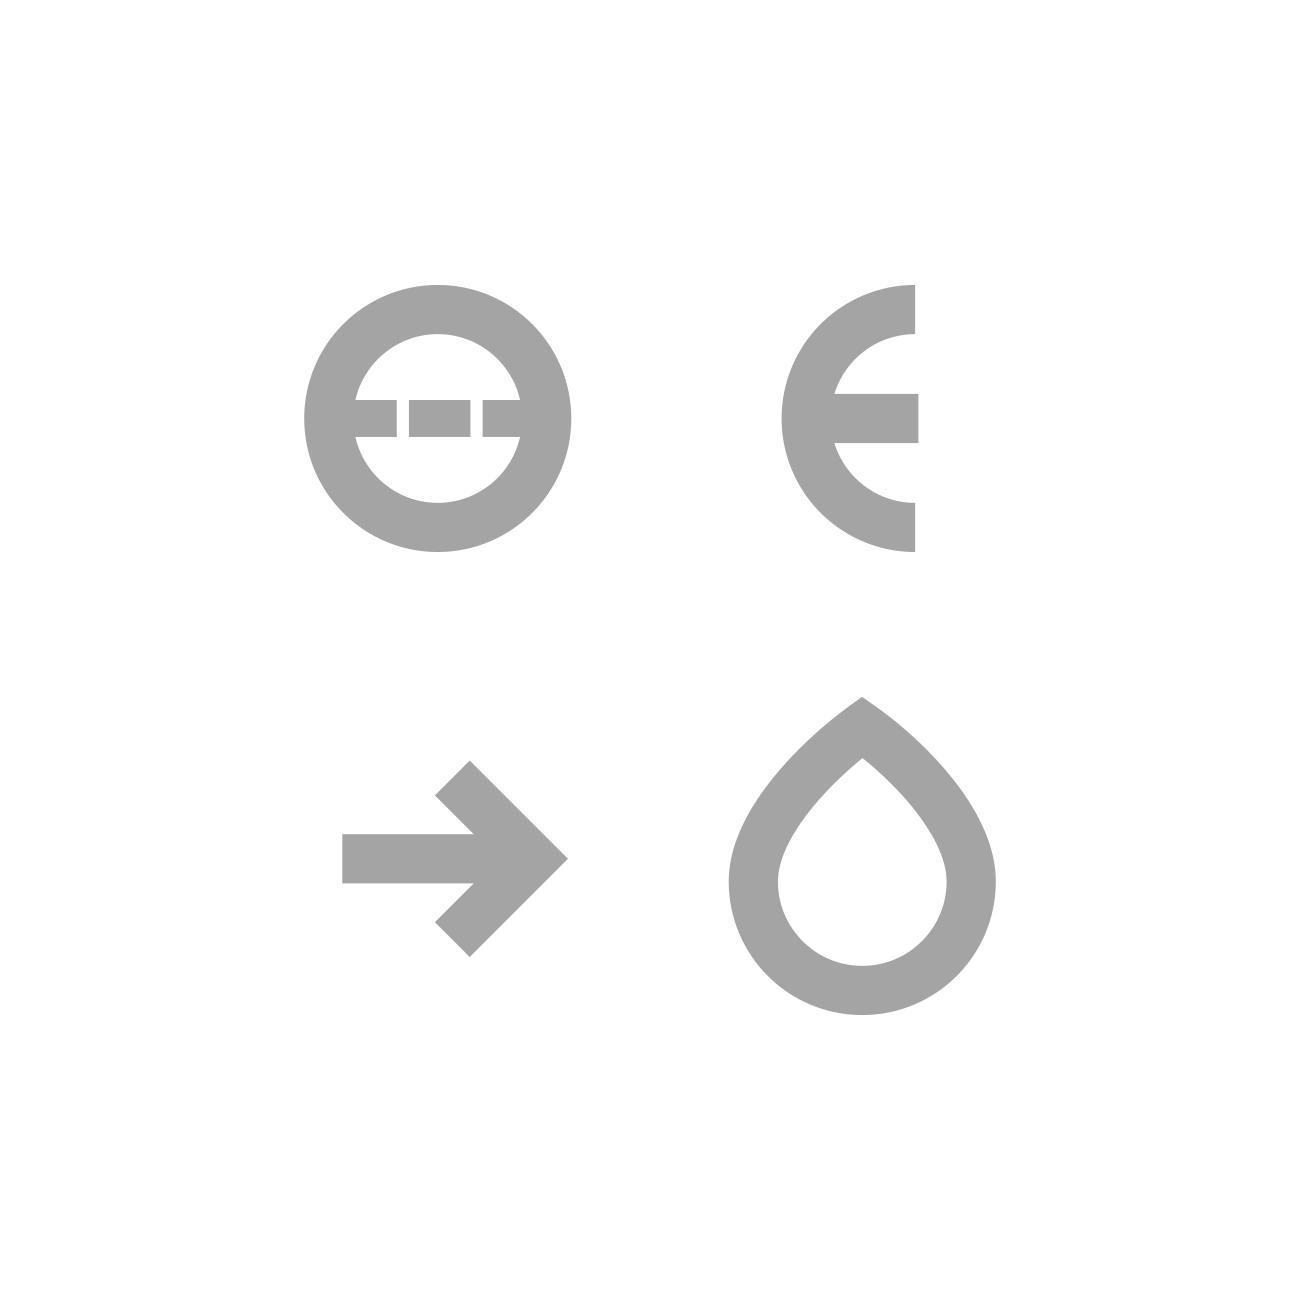 simbolo_01